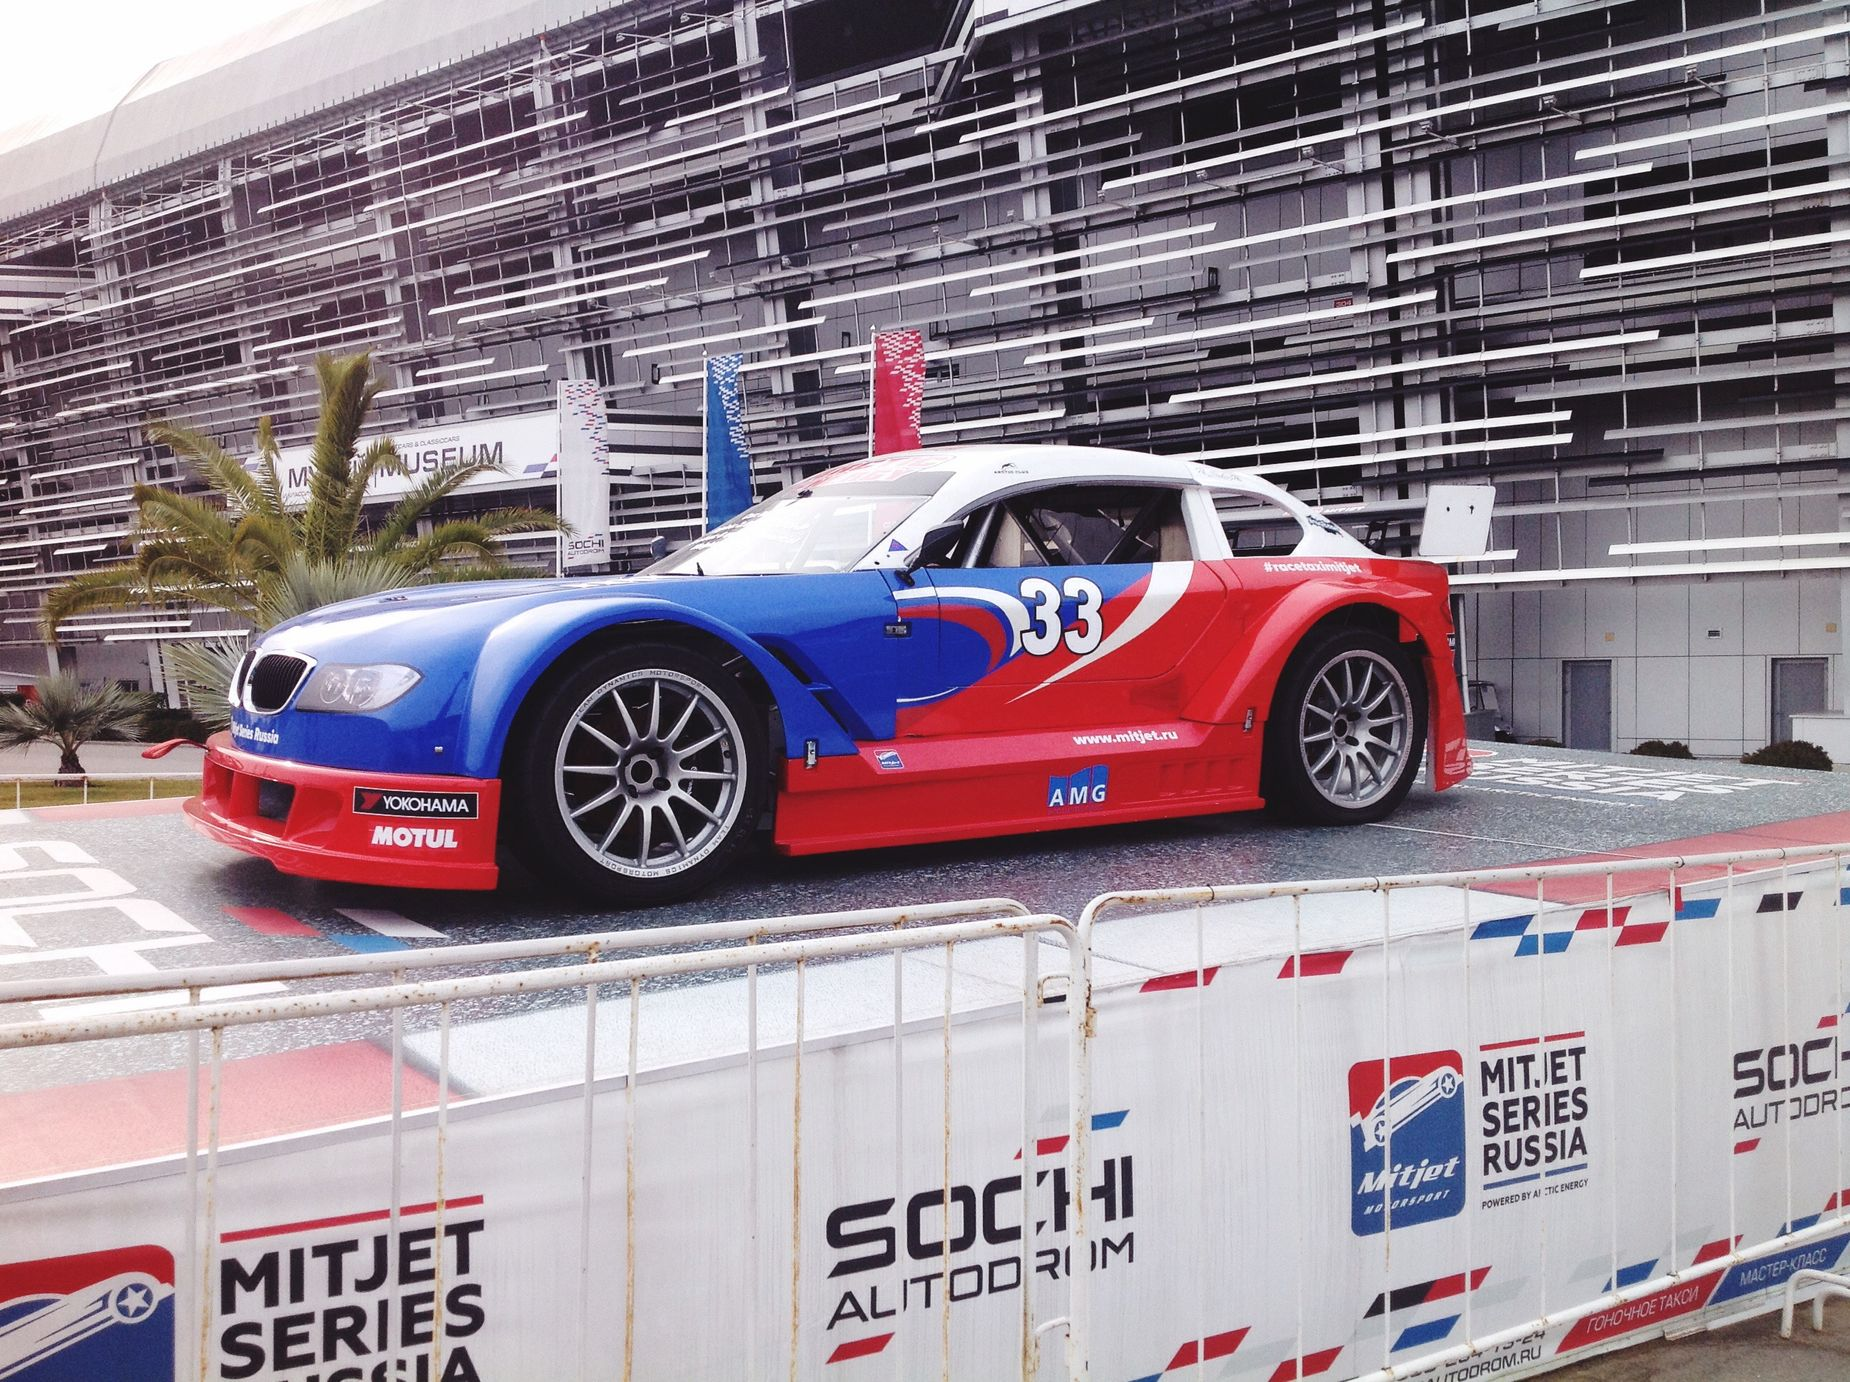 Mitjet Auto Sochi Olympic Park